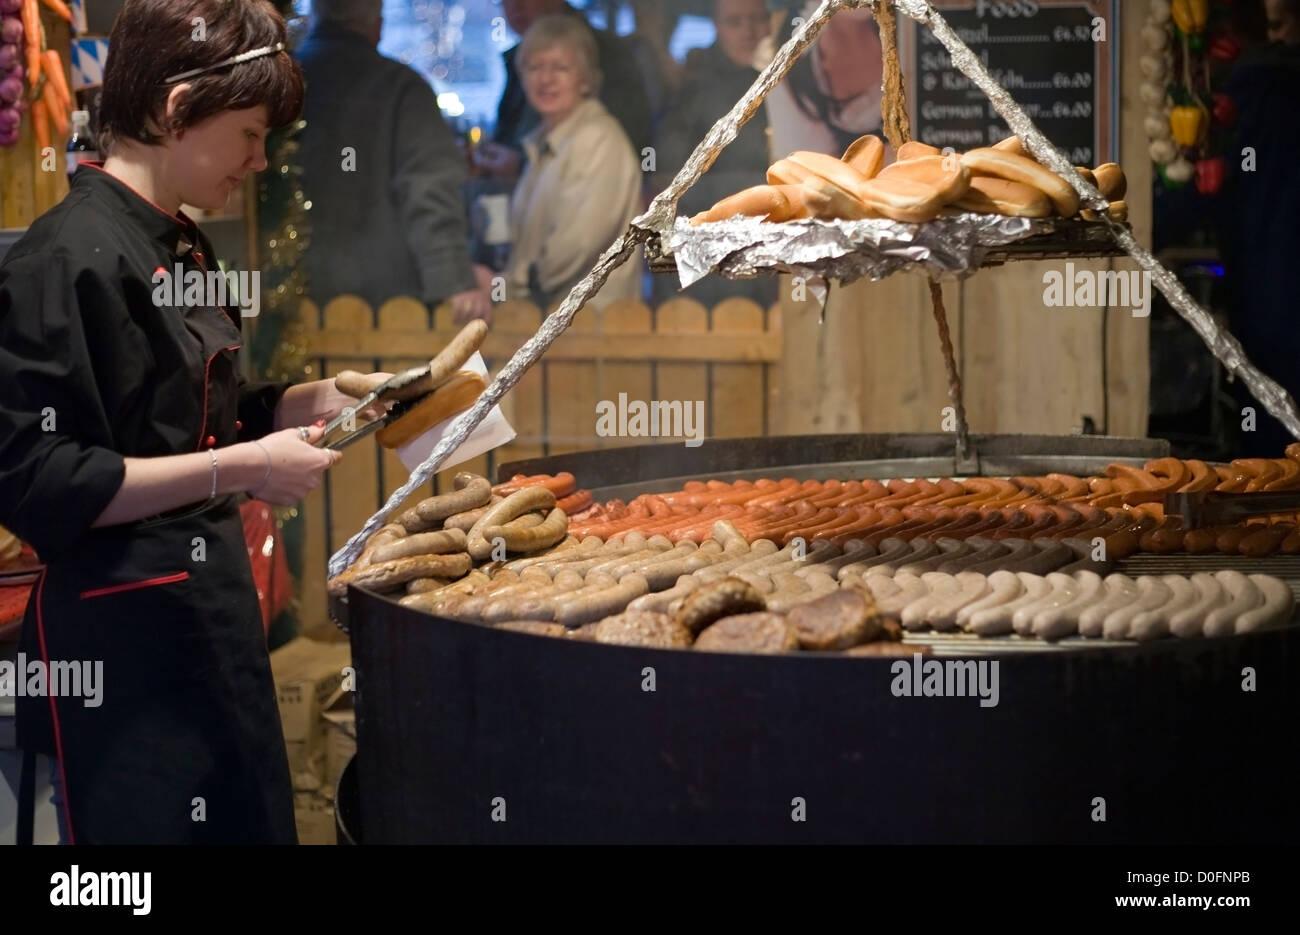 Manchester christmas market - Stock Image